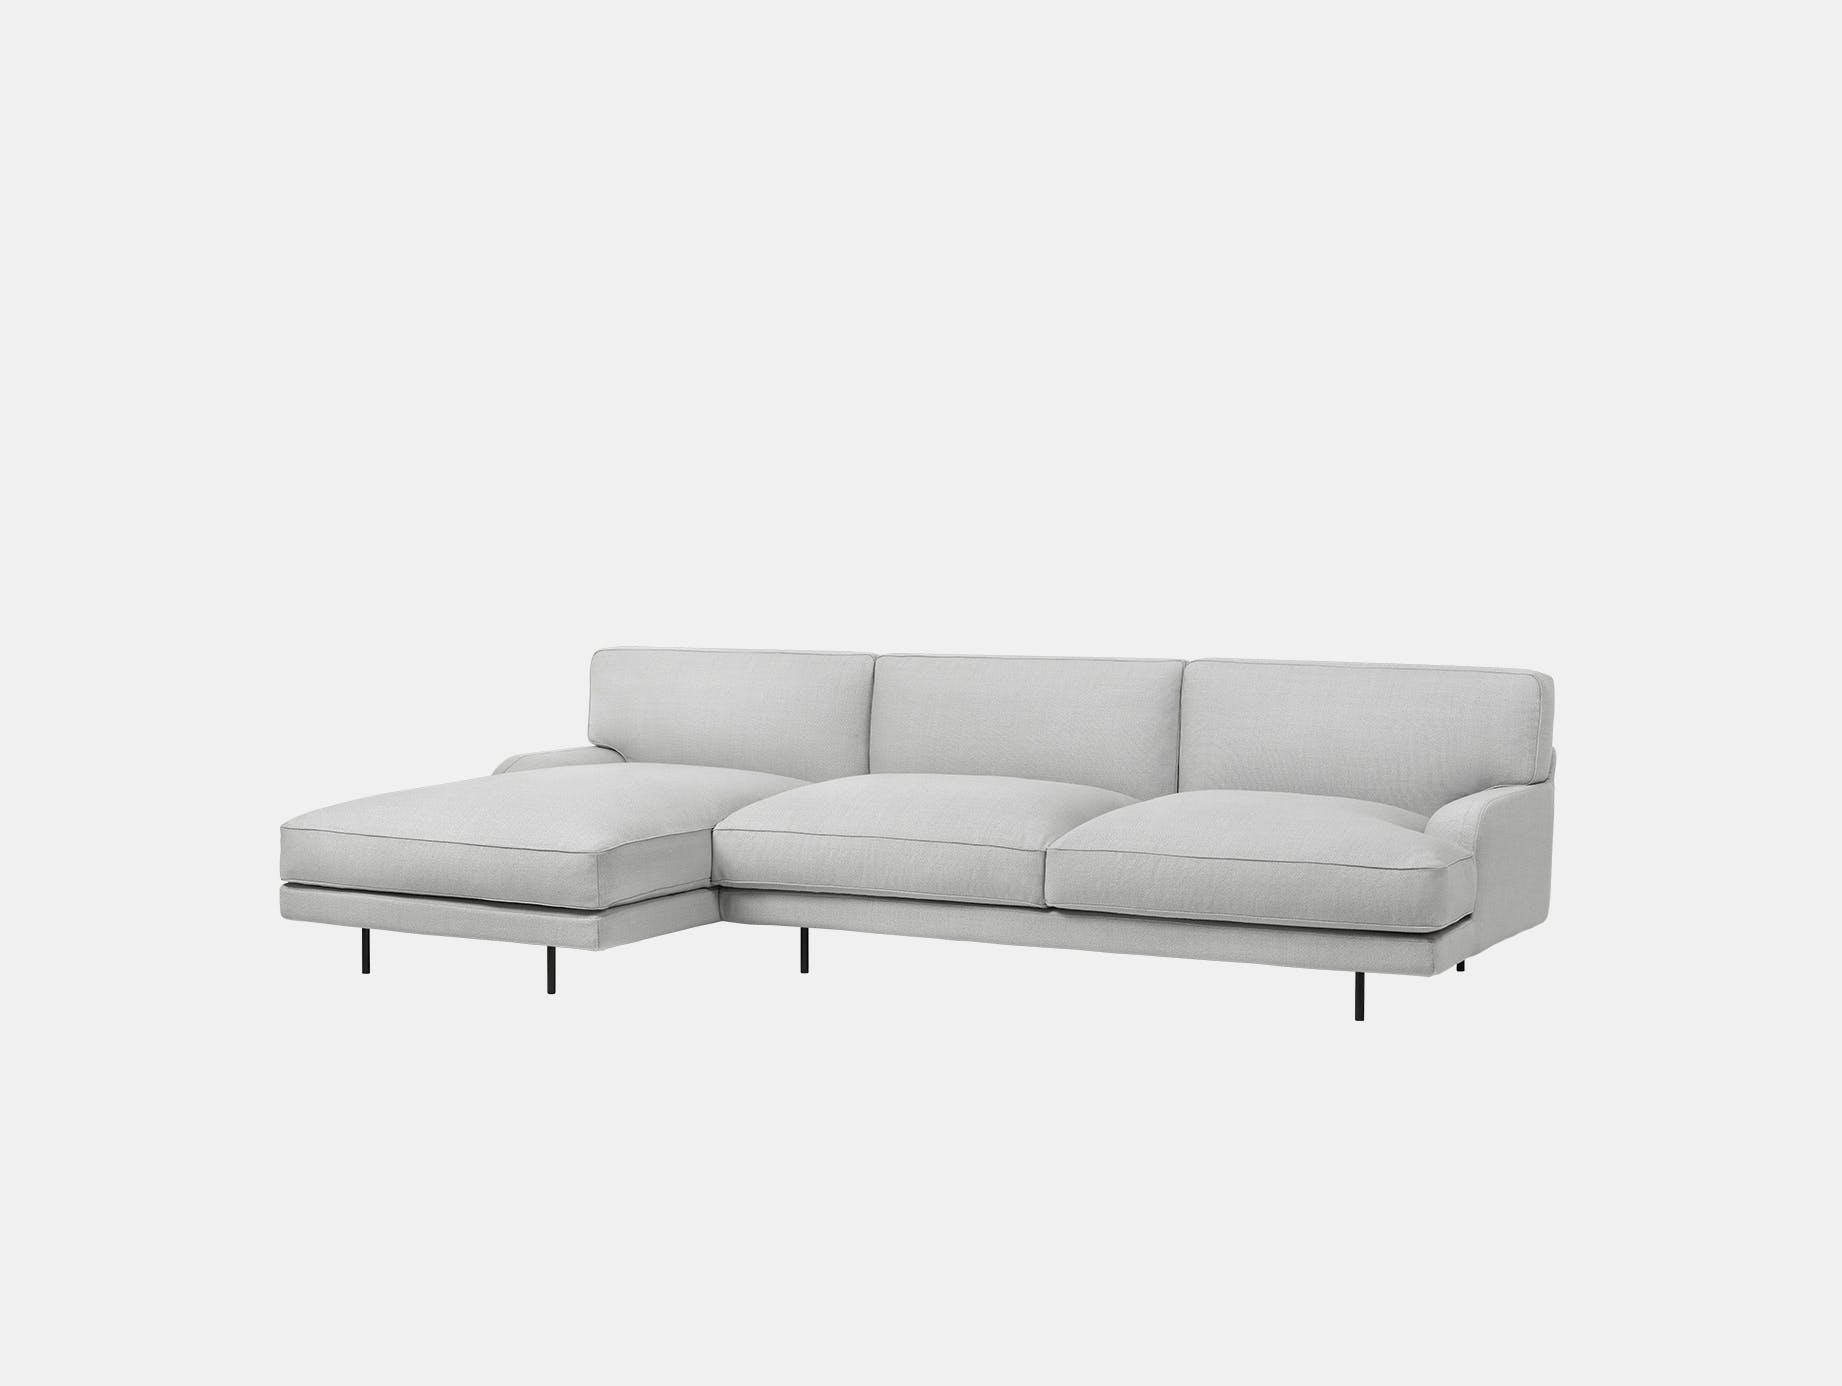 Gubi flaneur sofa w chaise famehybrid 1101 blk d